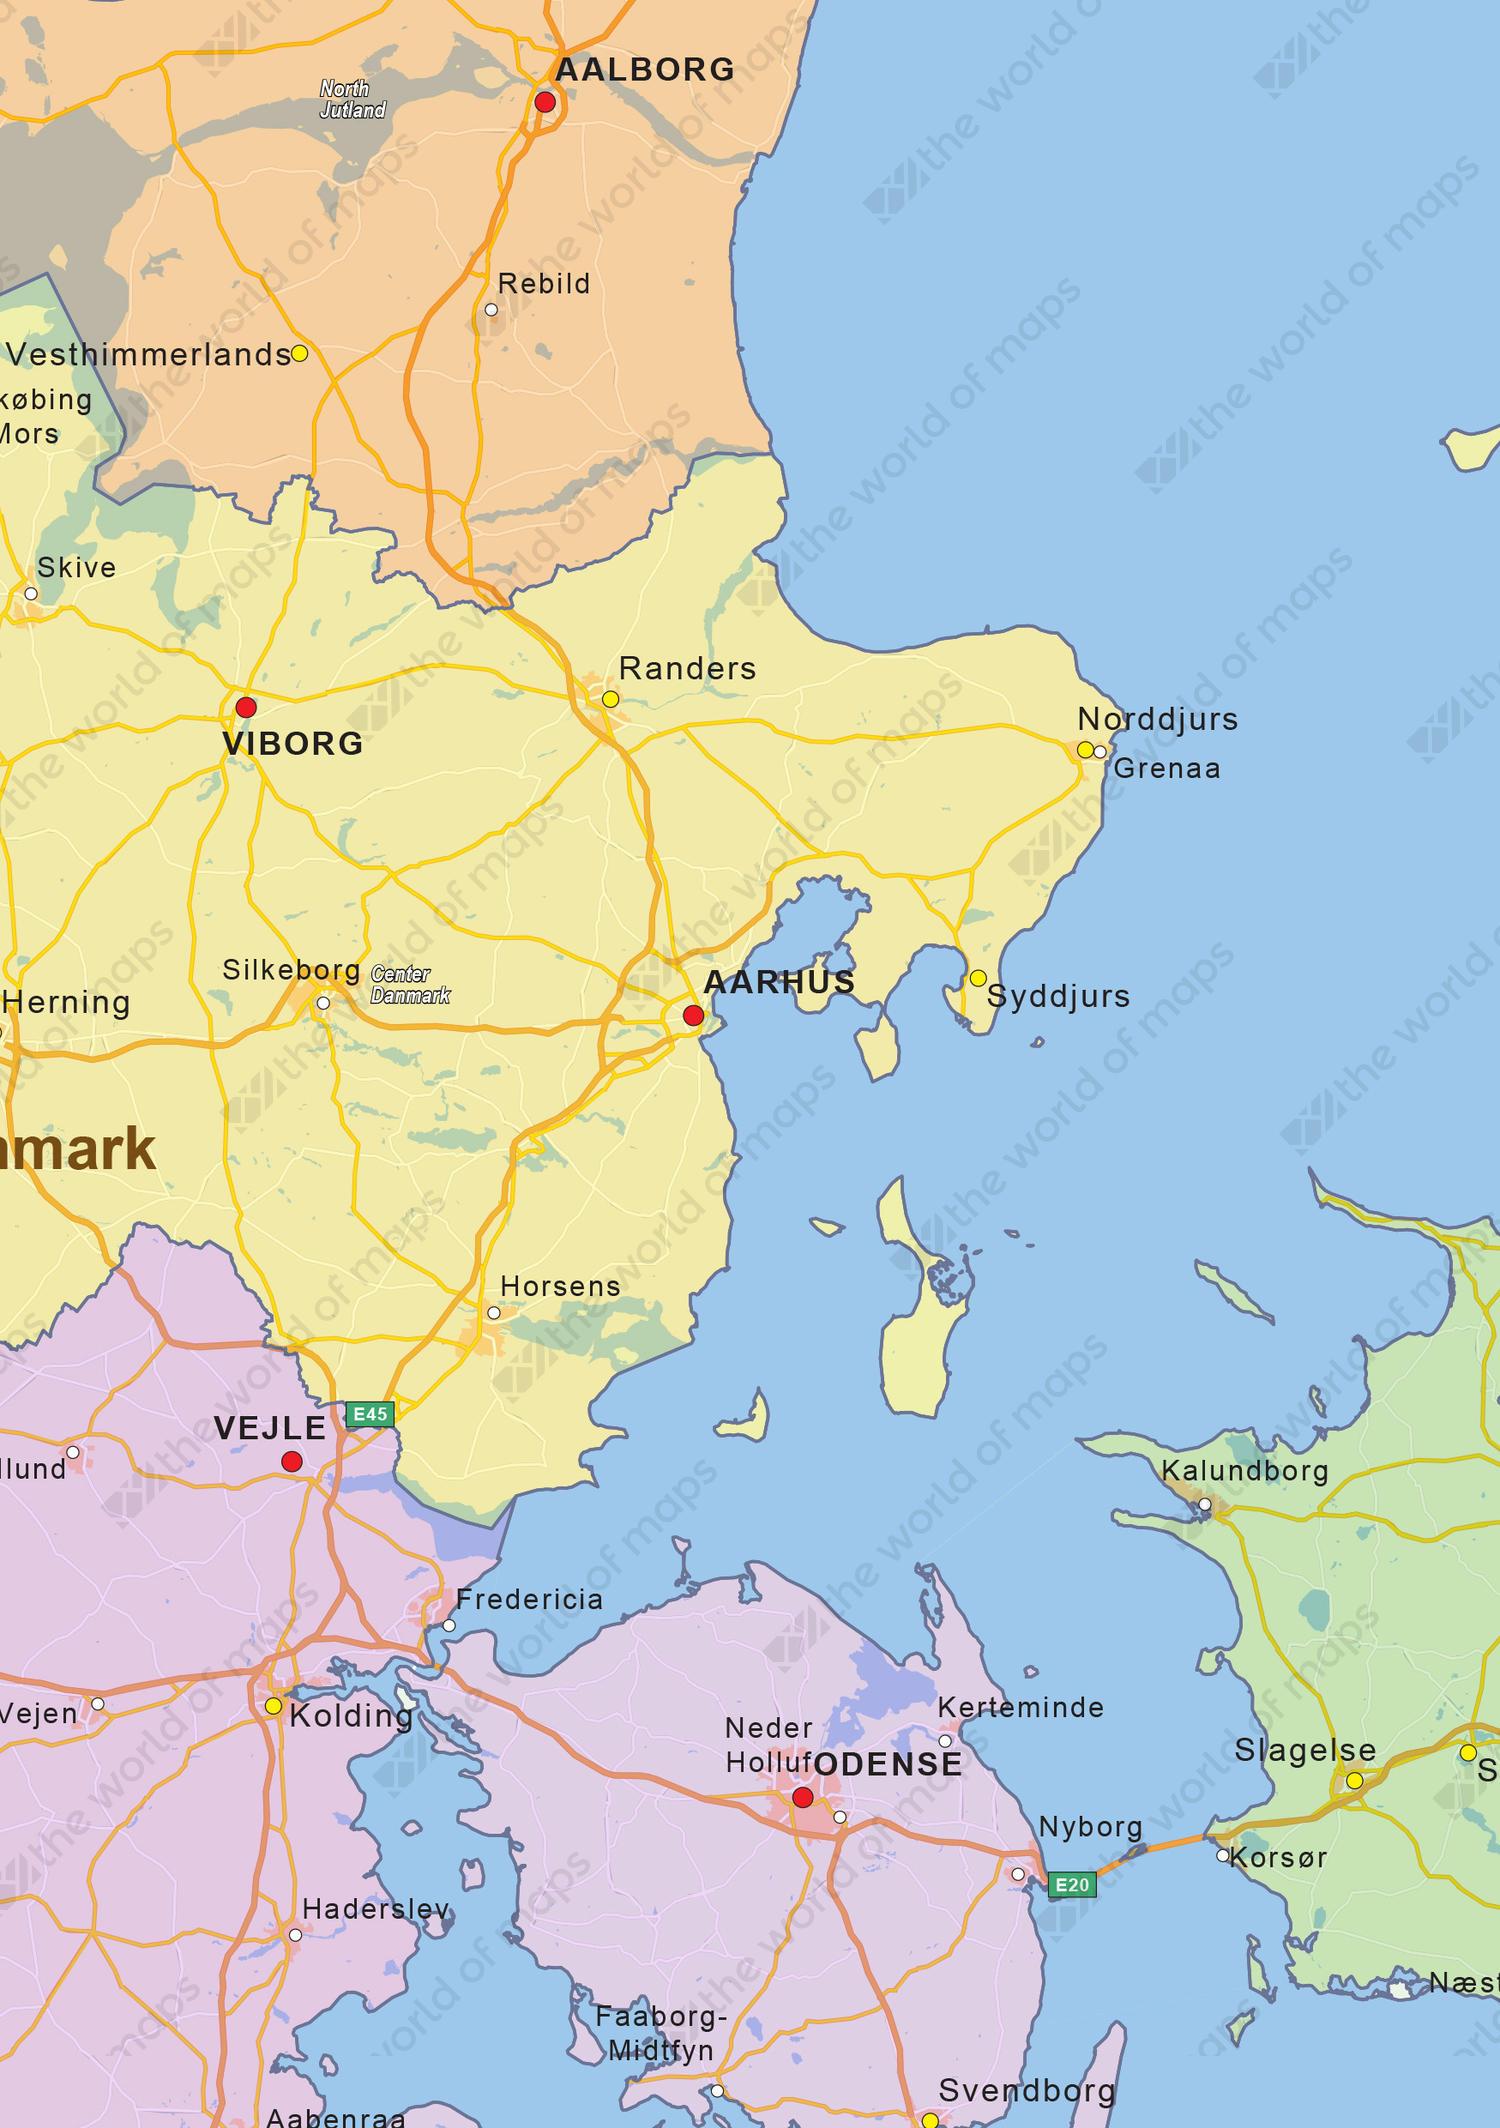 Digital political map of Denmark